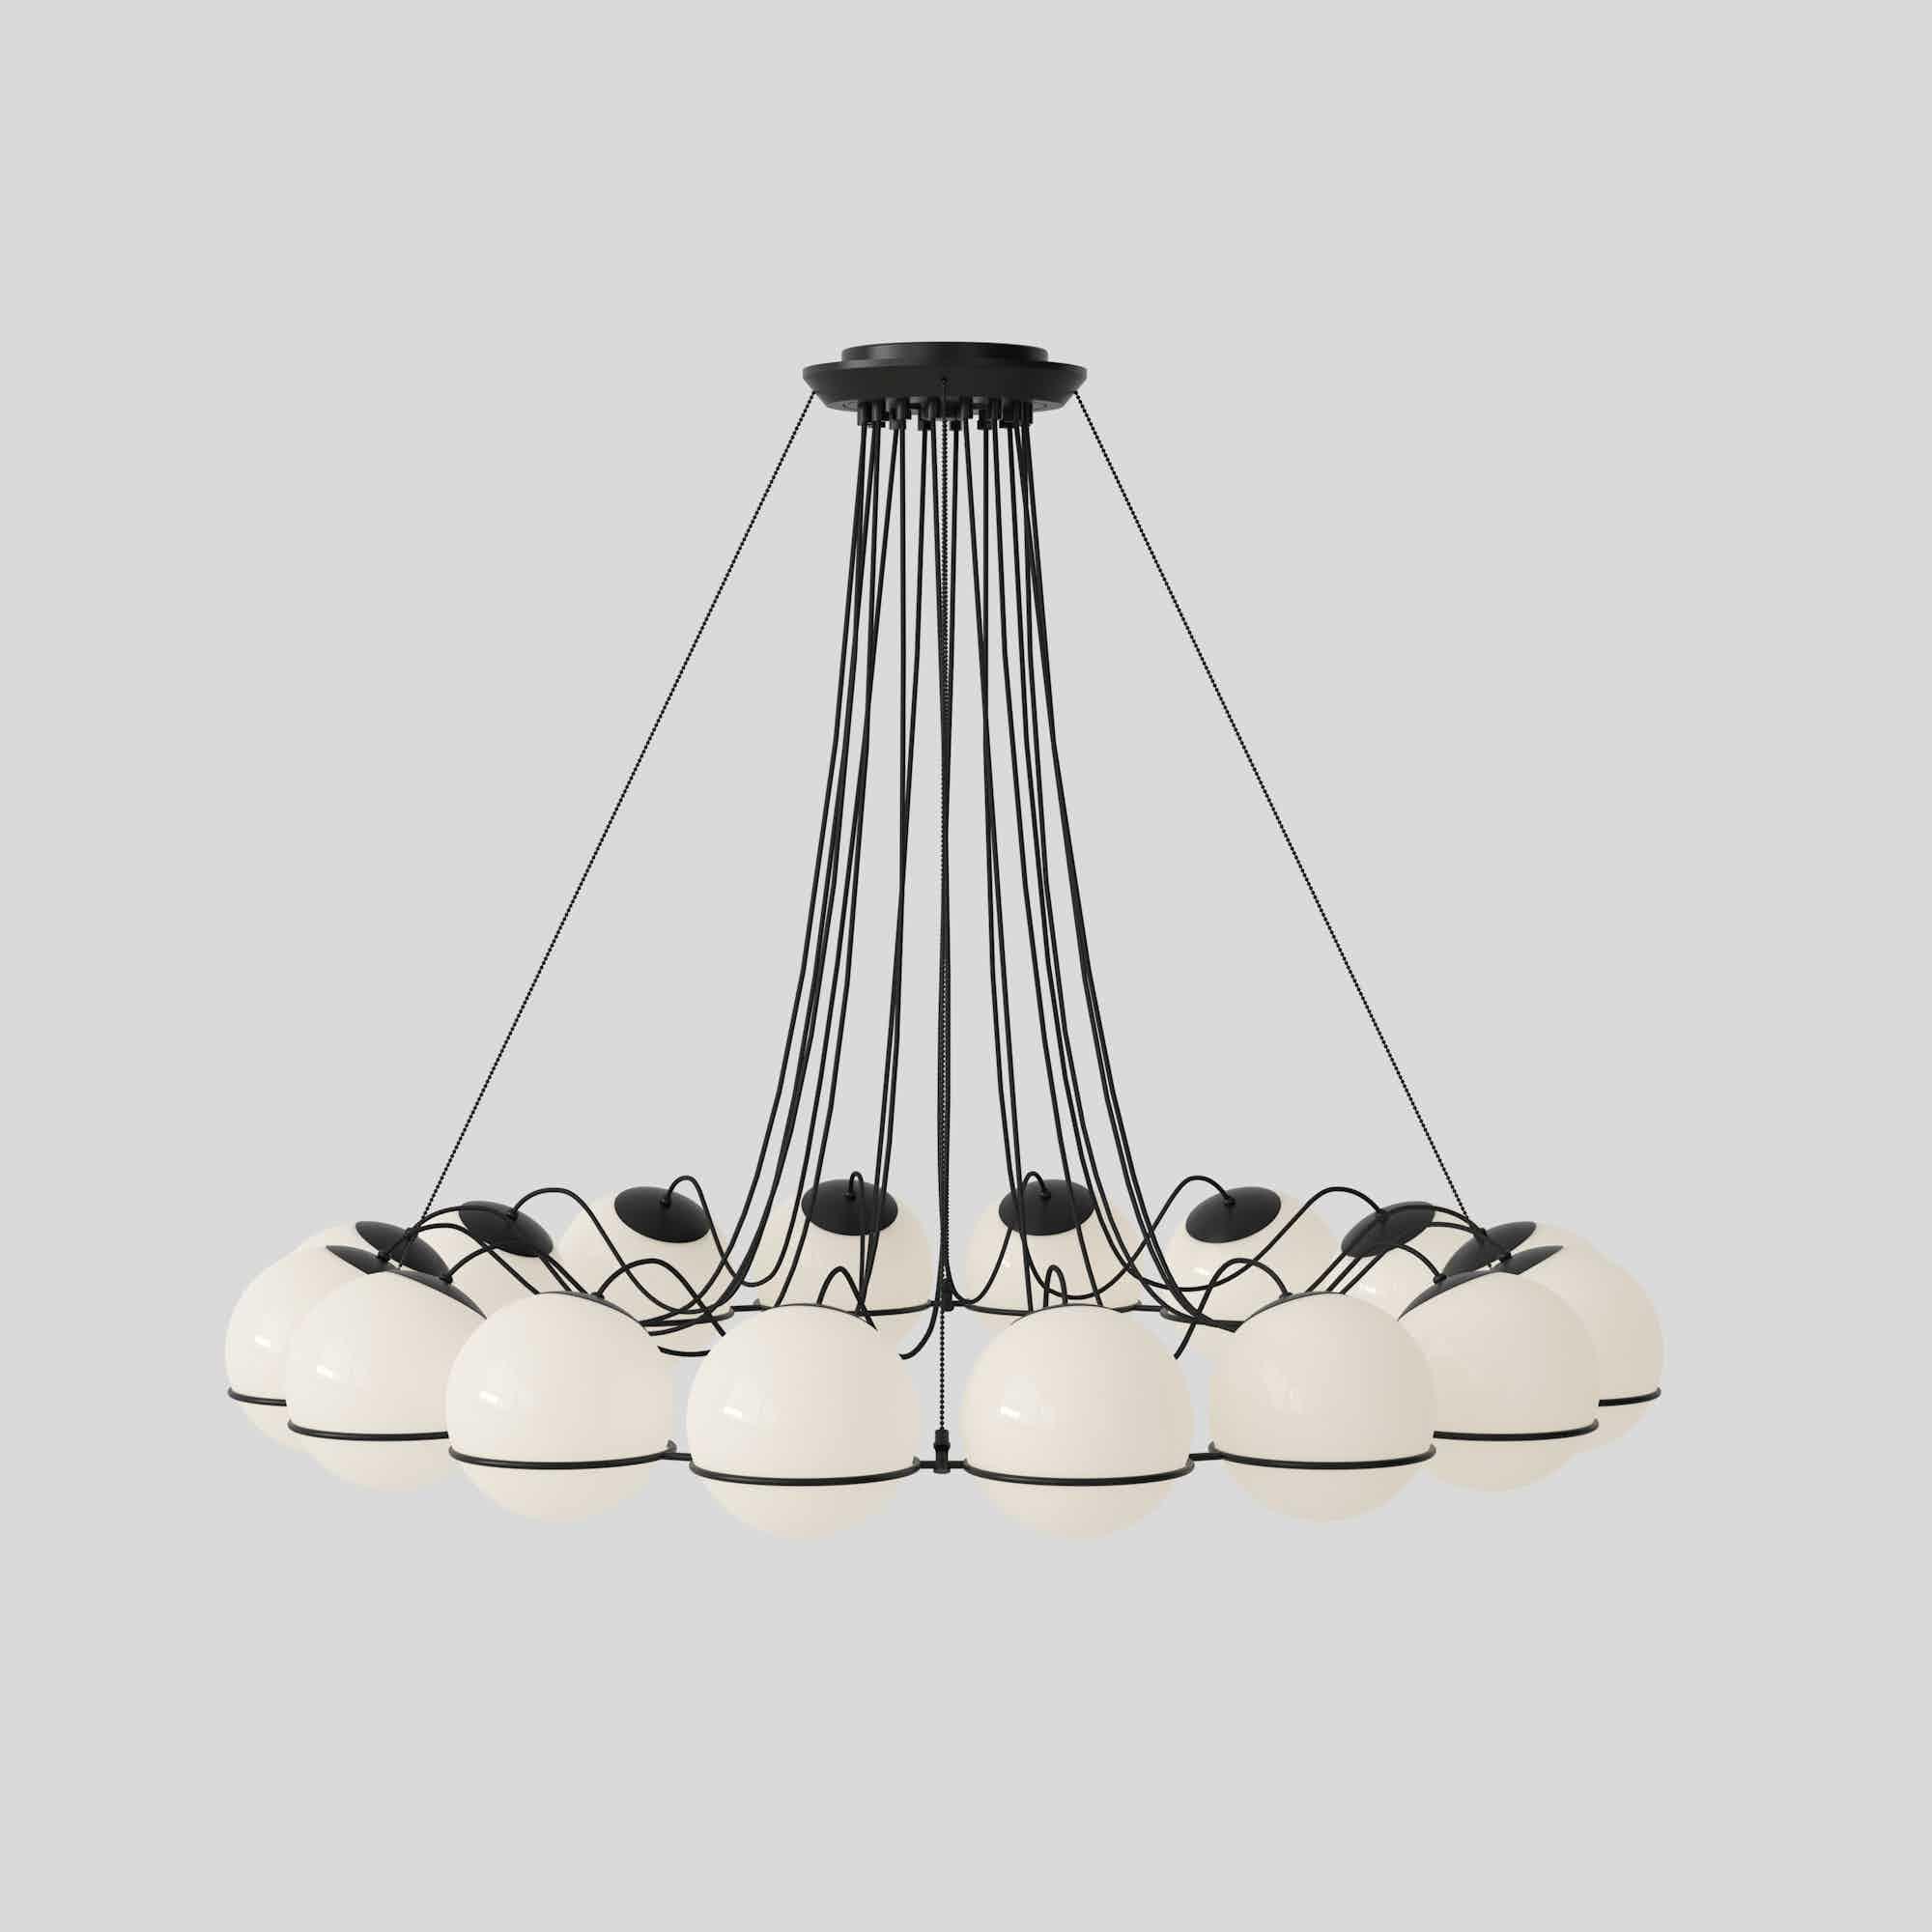 Astep lighting model 2109 on medium haute living